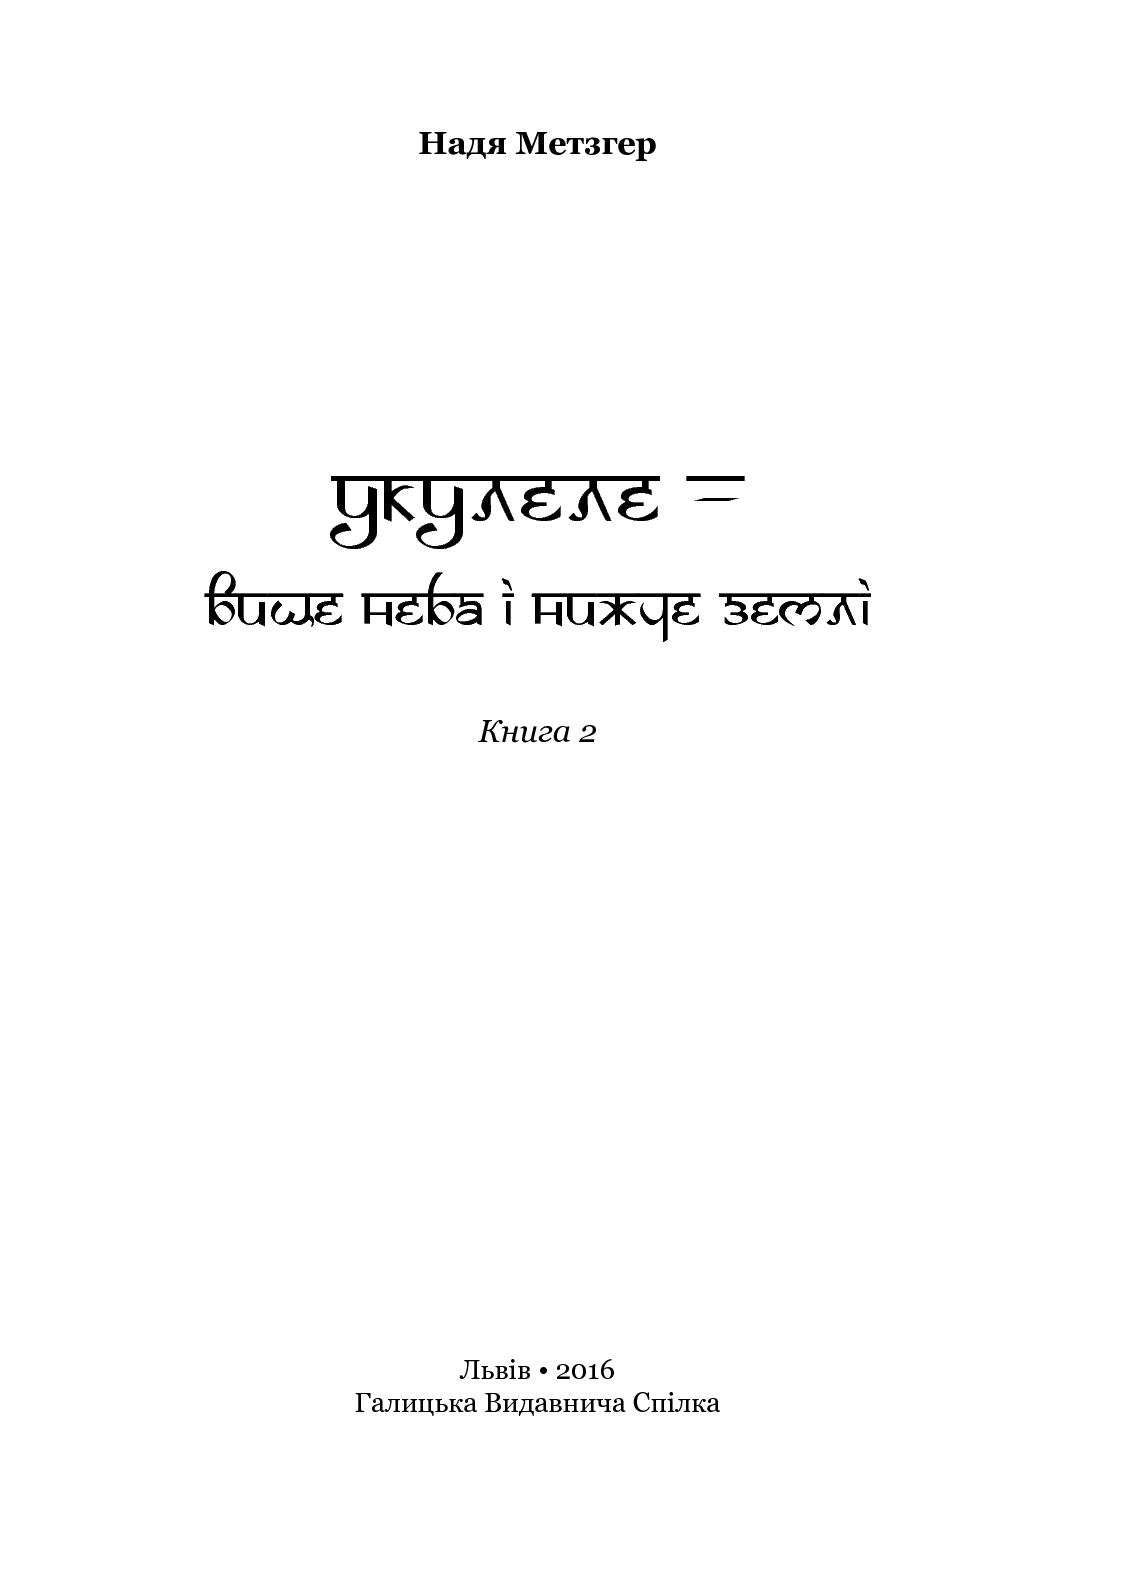 Calaméo - Надя Метзгер. УКУЛЕЛЕ — Вище неба і нижче землі. Книга 2. 163c24ca4a76f